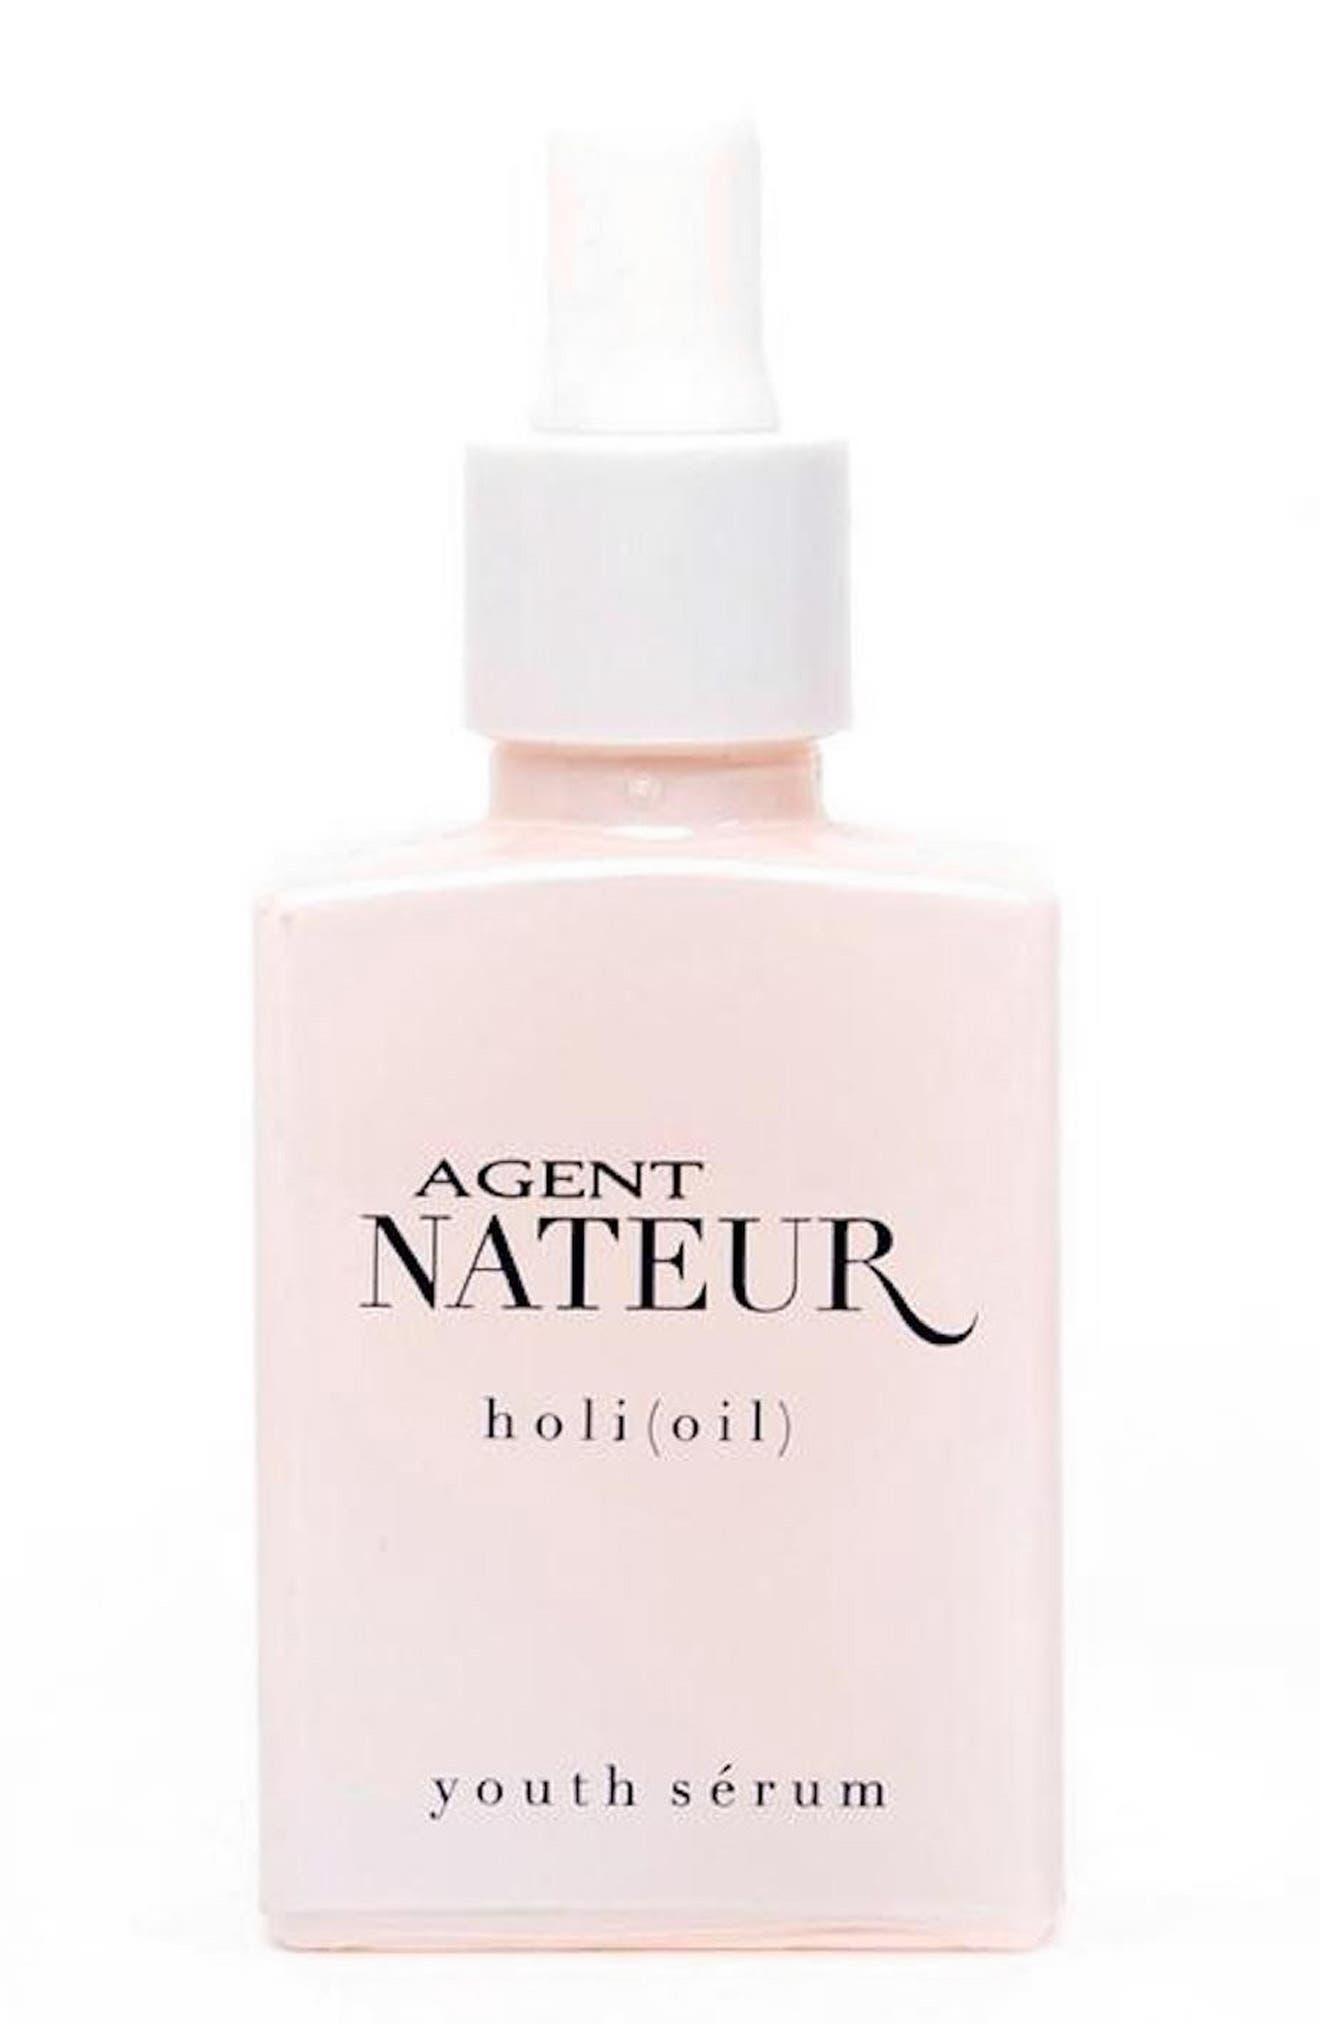 AGENT NATEUR Holi (Oil) Youth Serum, 1.0 Oz./ 30 Ml